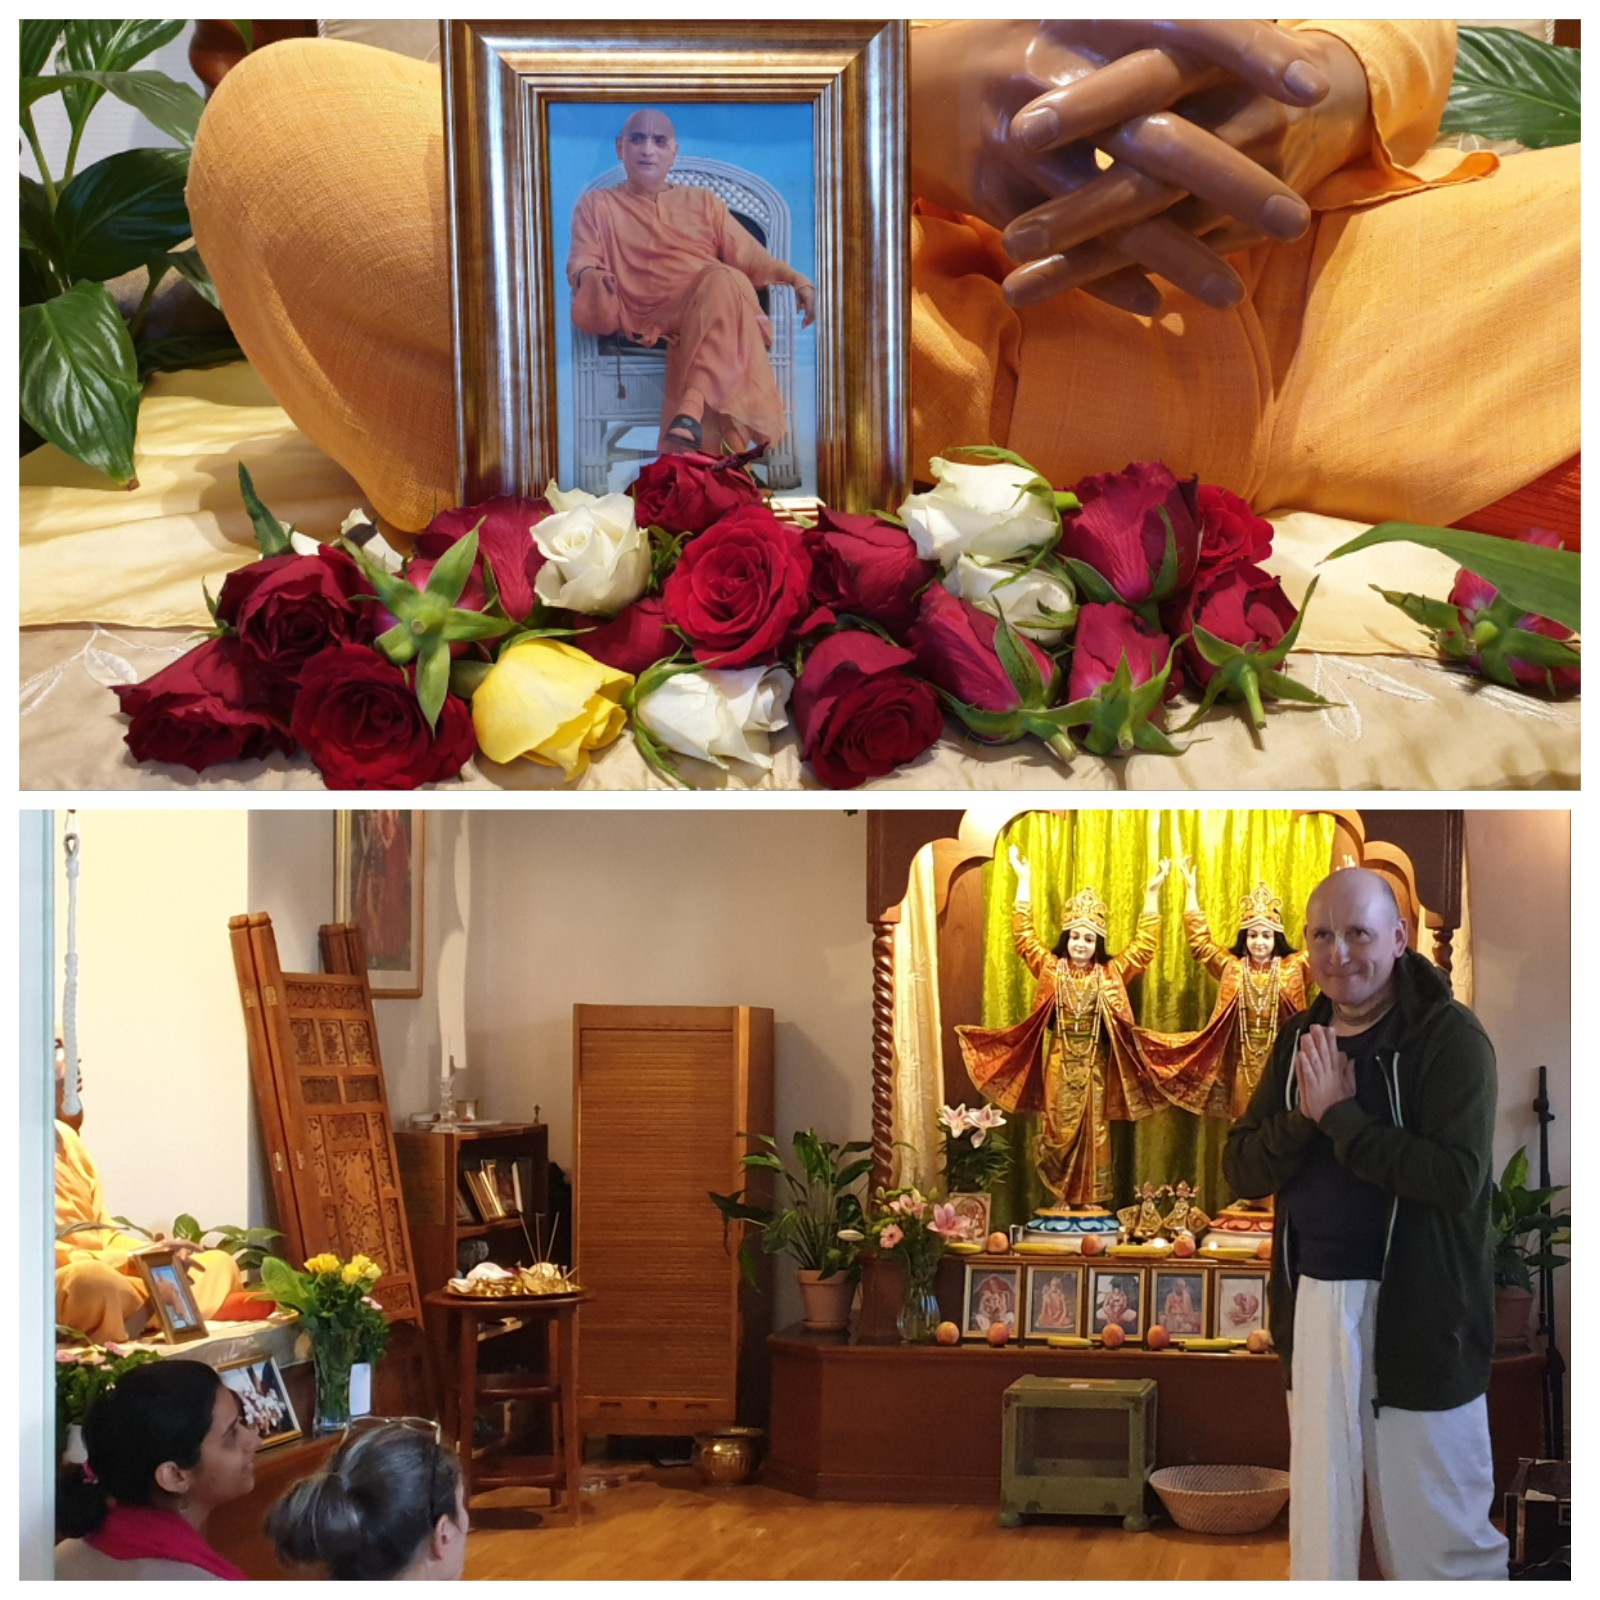 Sweden Pays Homage to the Spiritual Leader: Bhakti Charu Swami Maharaj